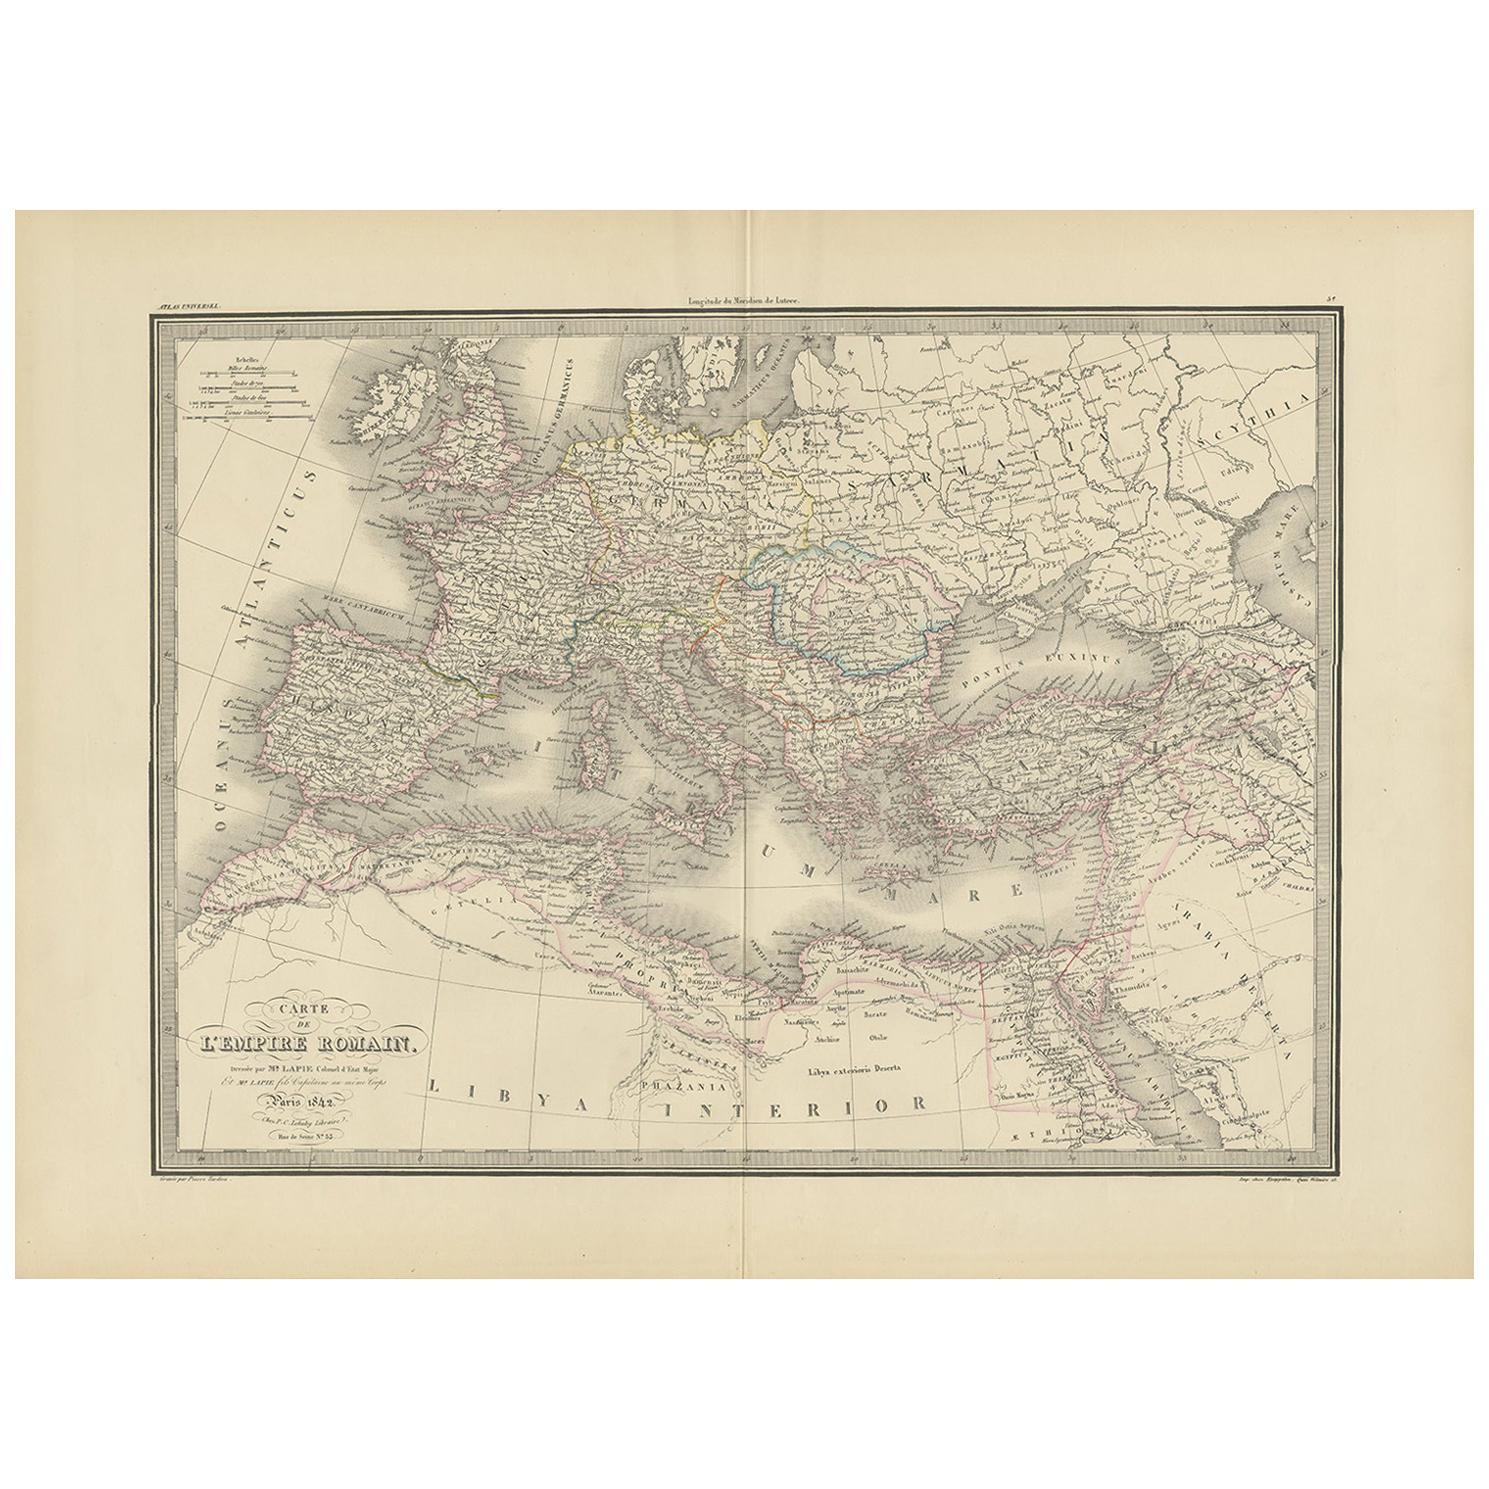 Antique Map of the Roman Empire by Lapie, 1842